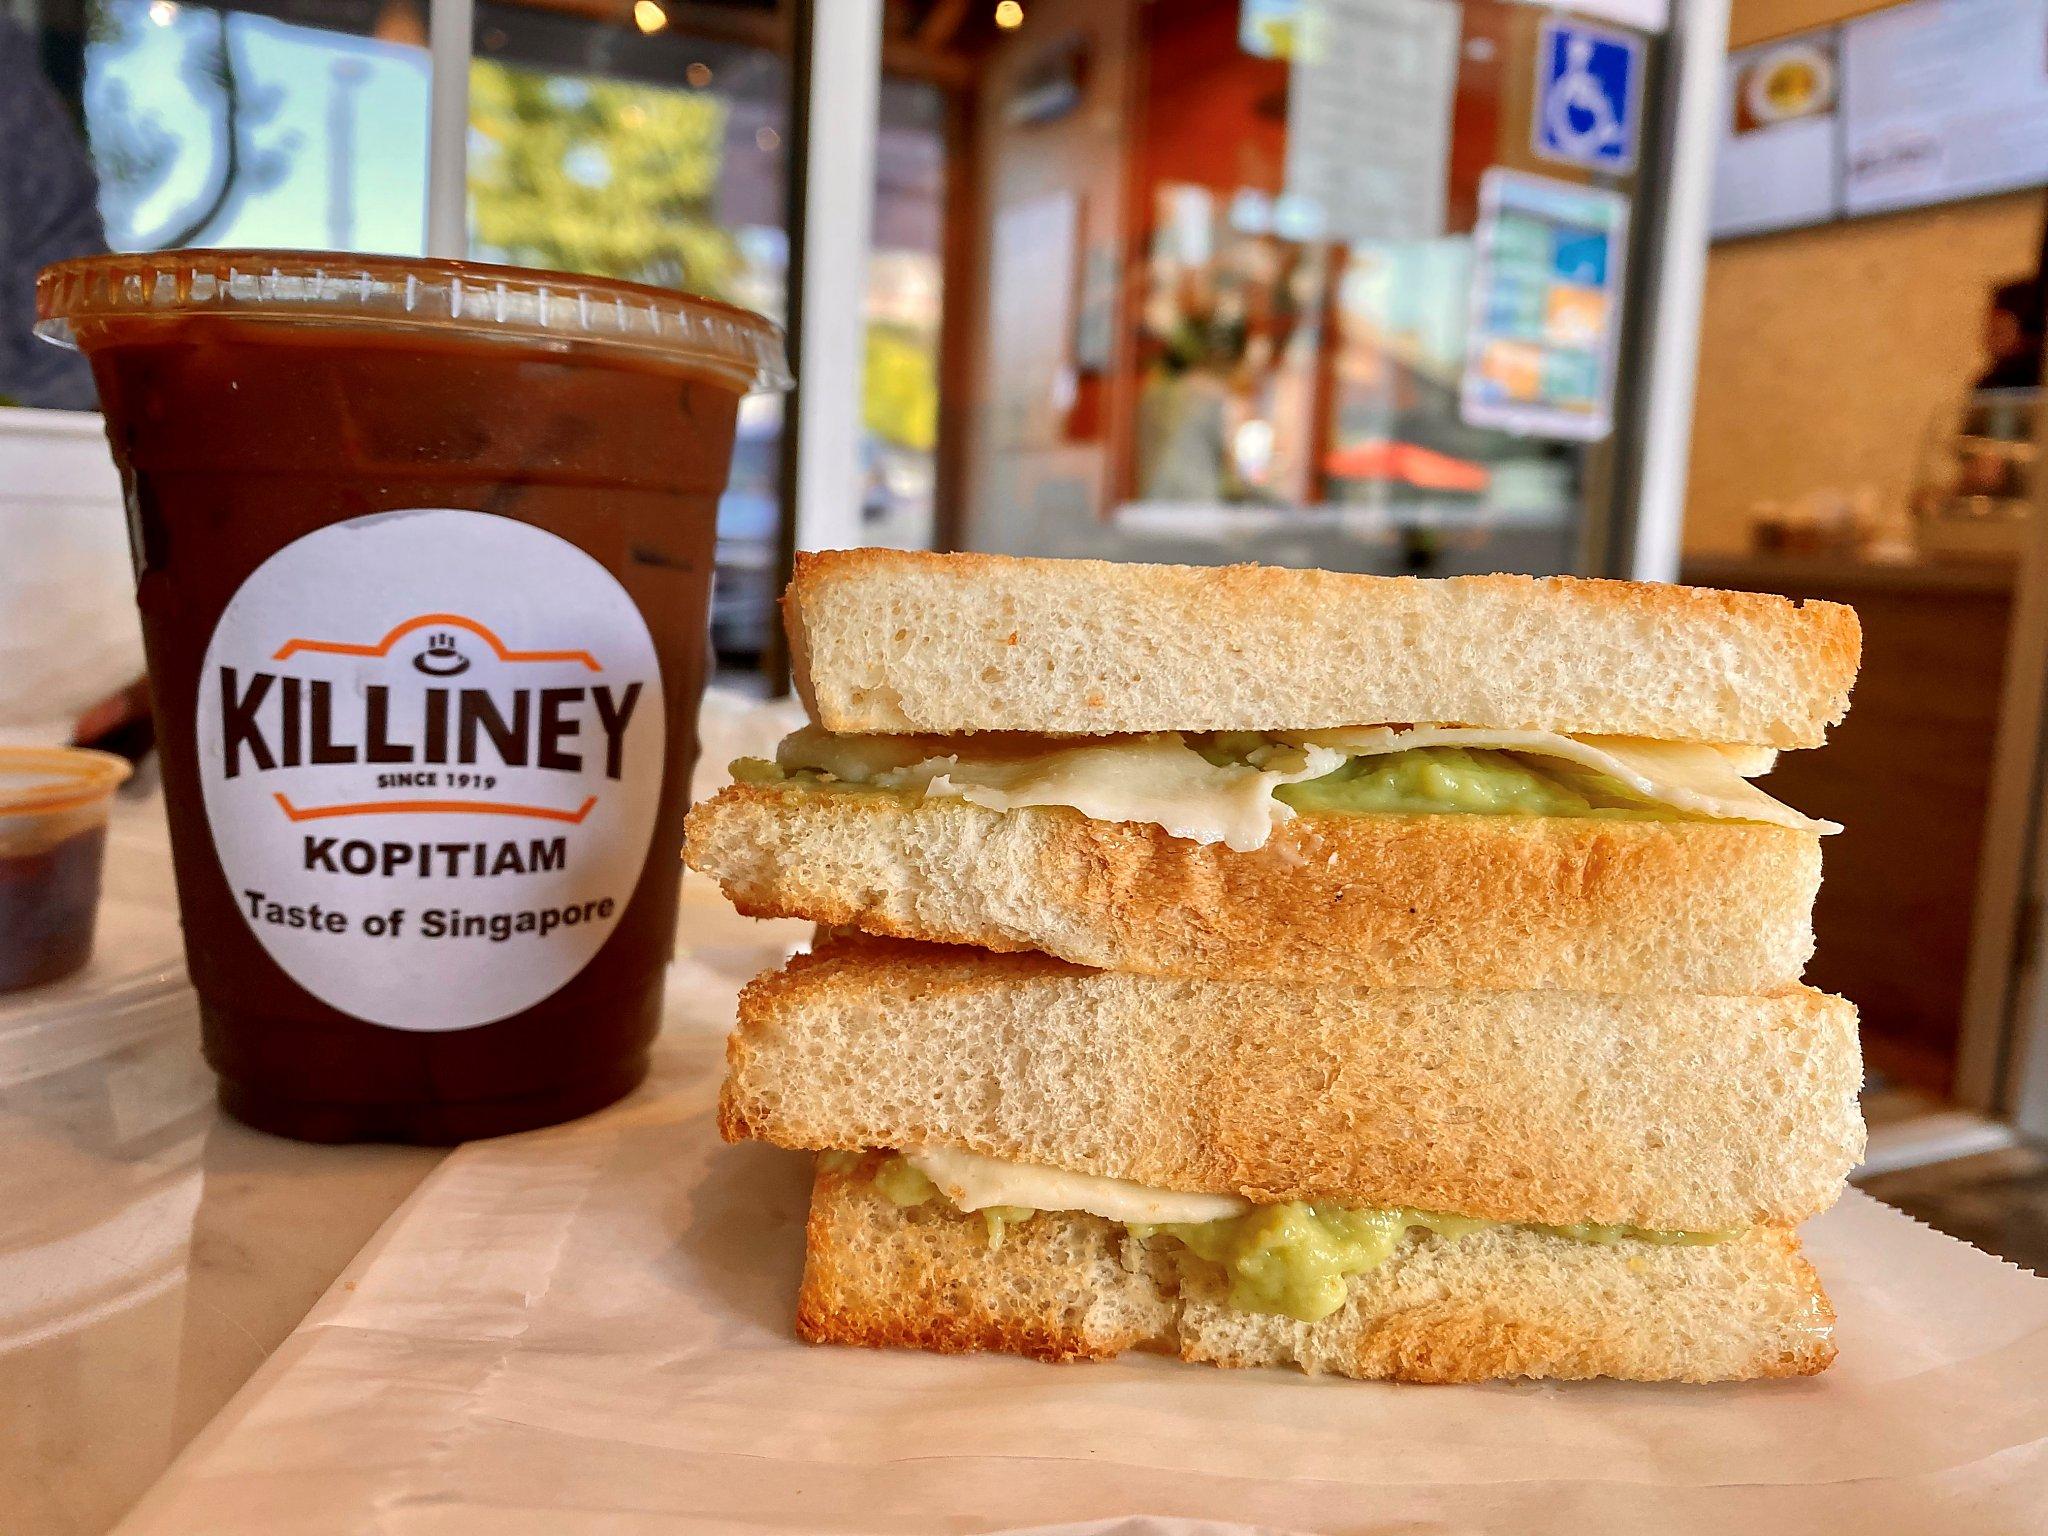 Singapore's oldest cafe Killiney Kopitiam is plotting a massive Bay Area expansion push